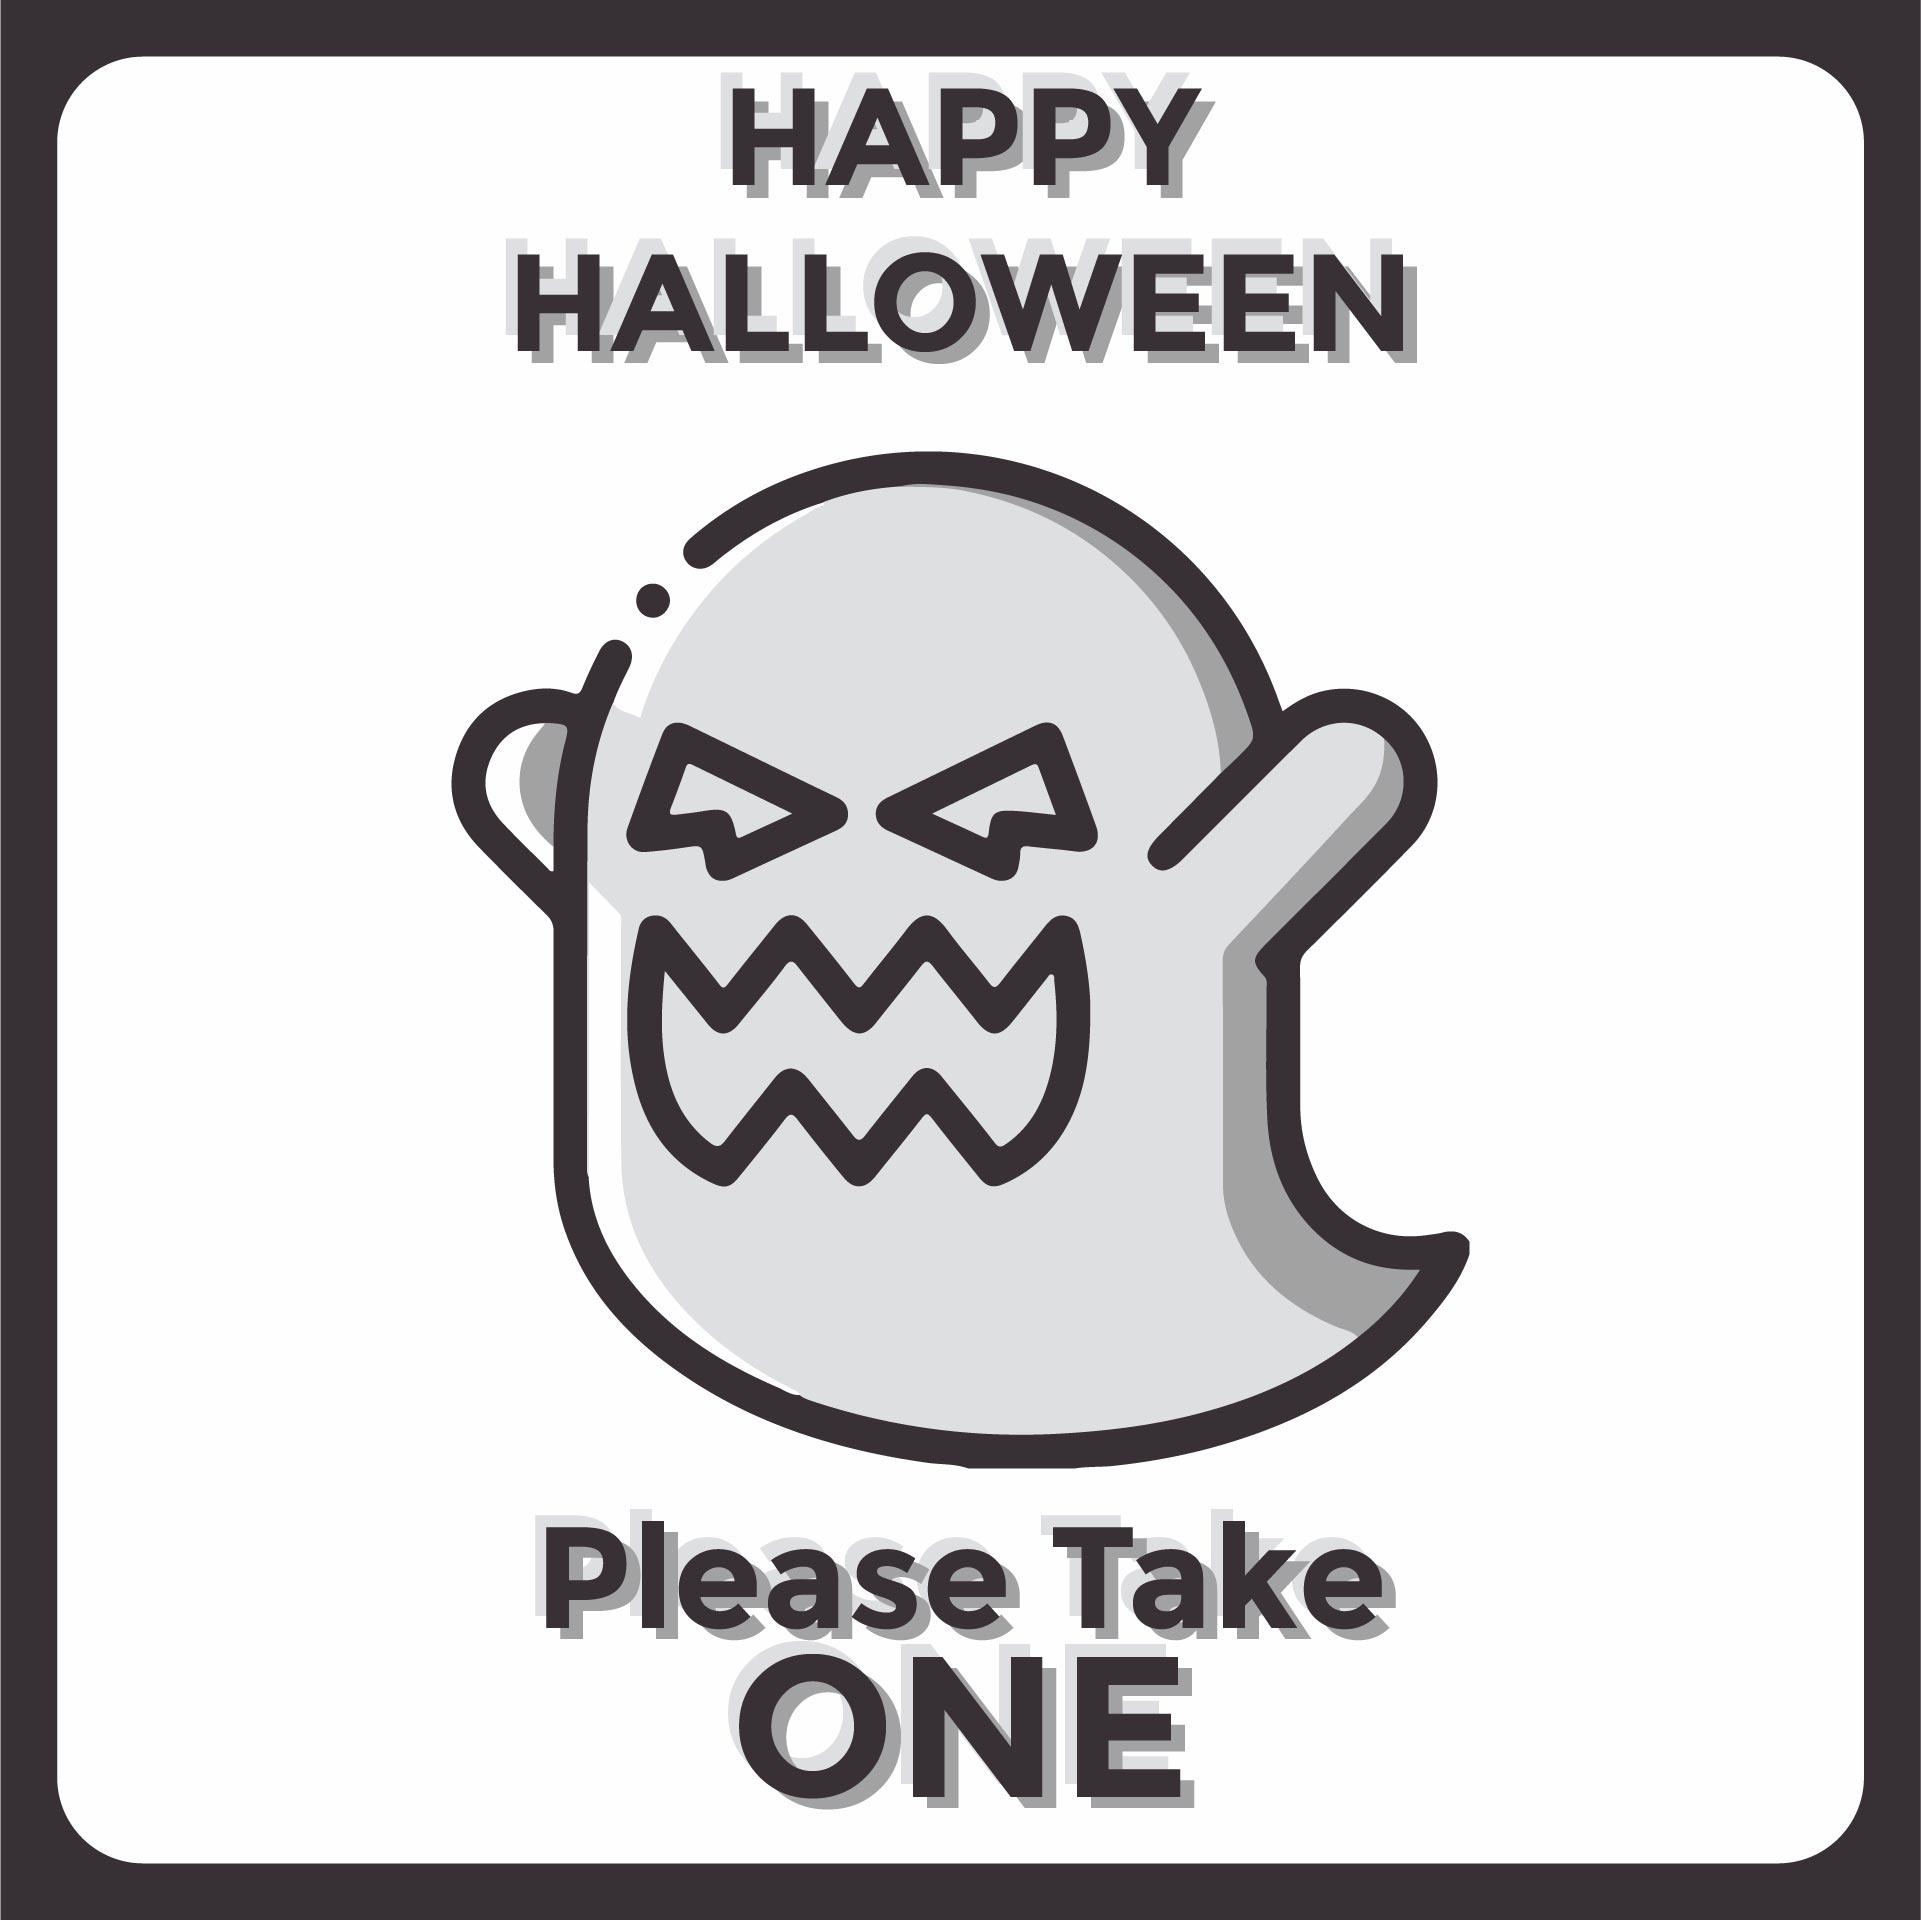 Printable Halloween Candy Bowl Signs